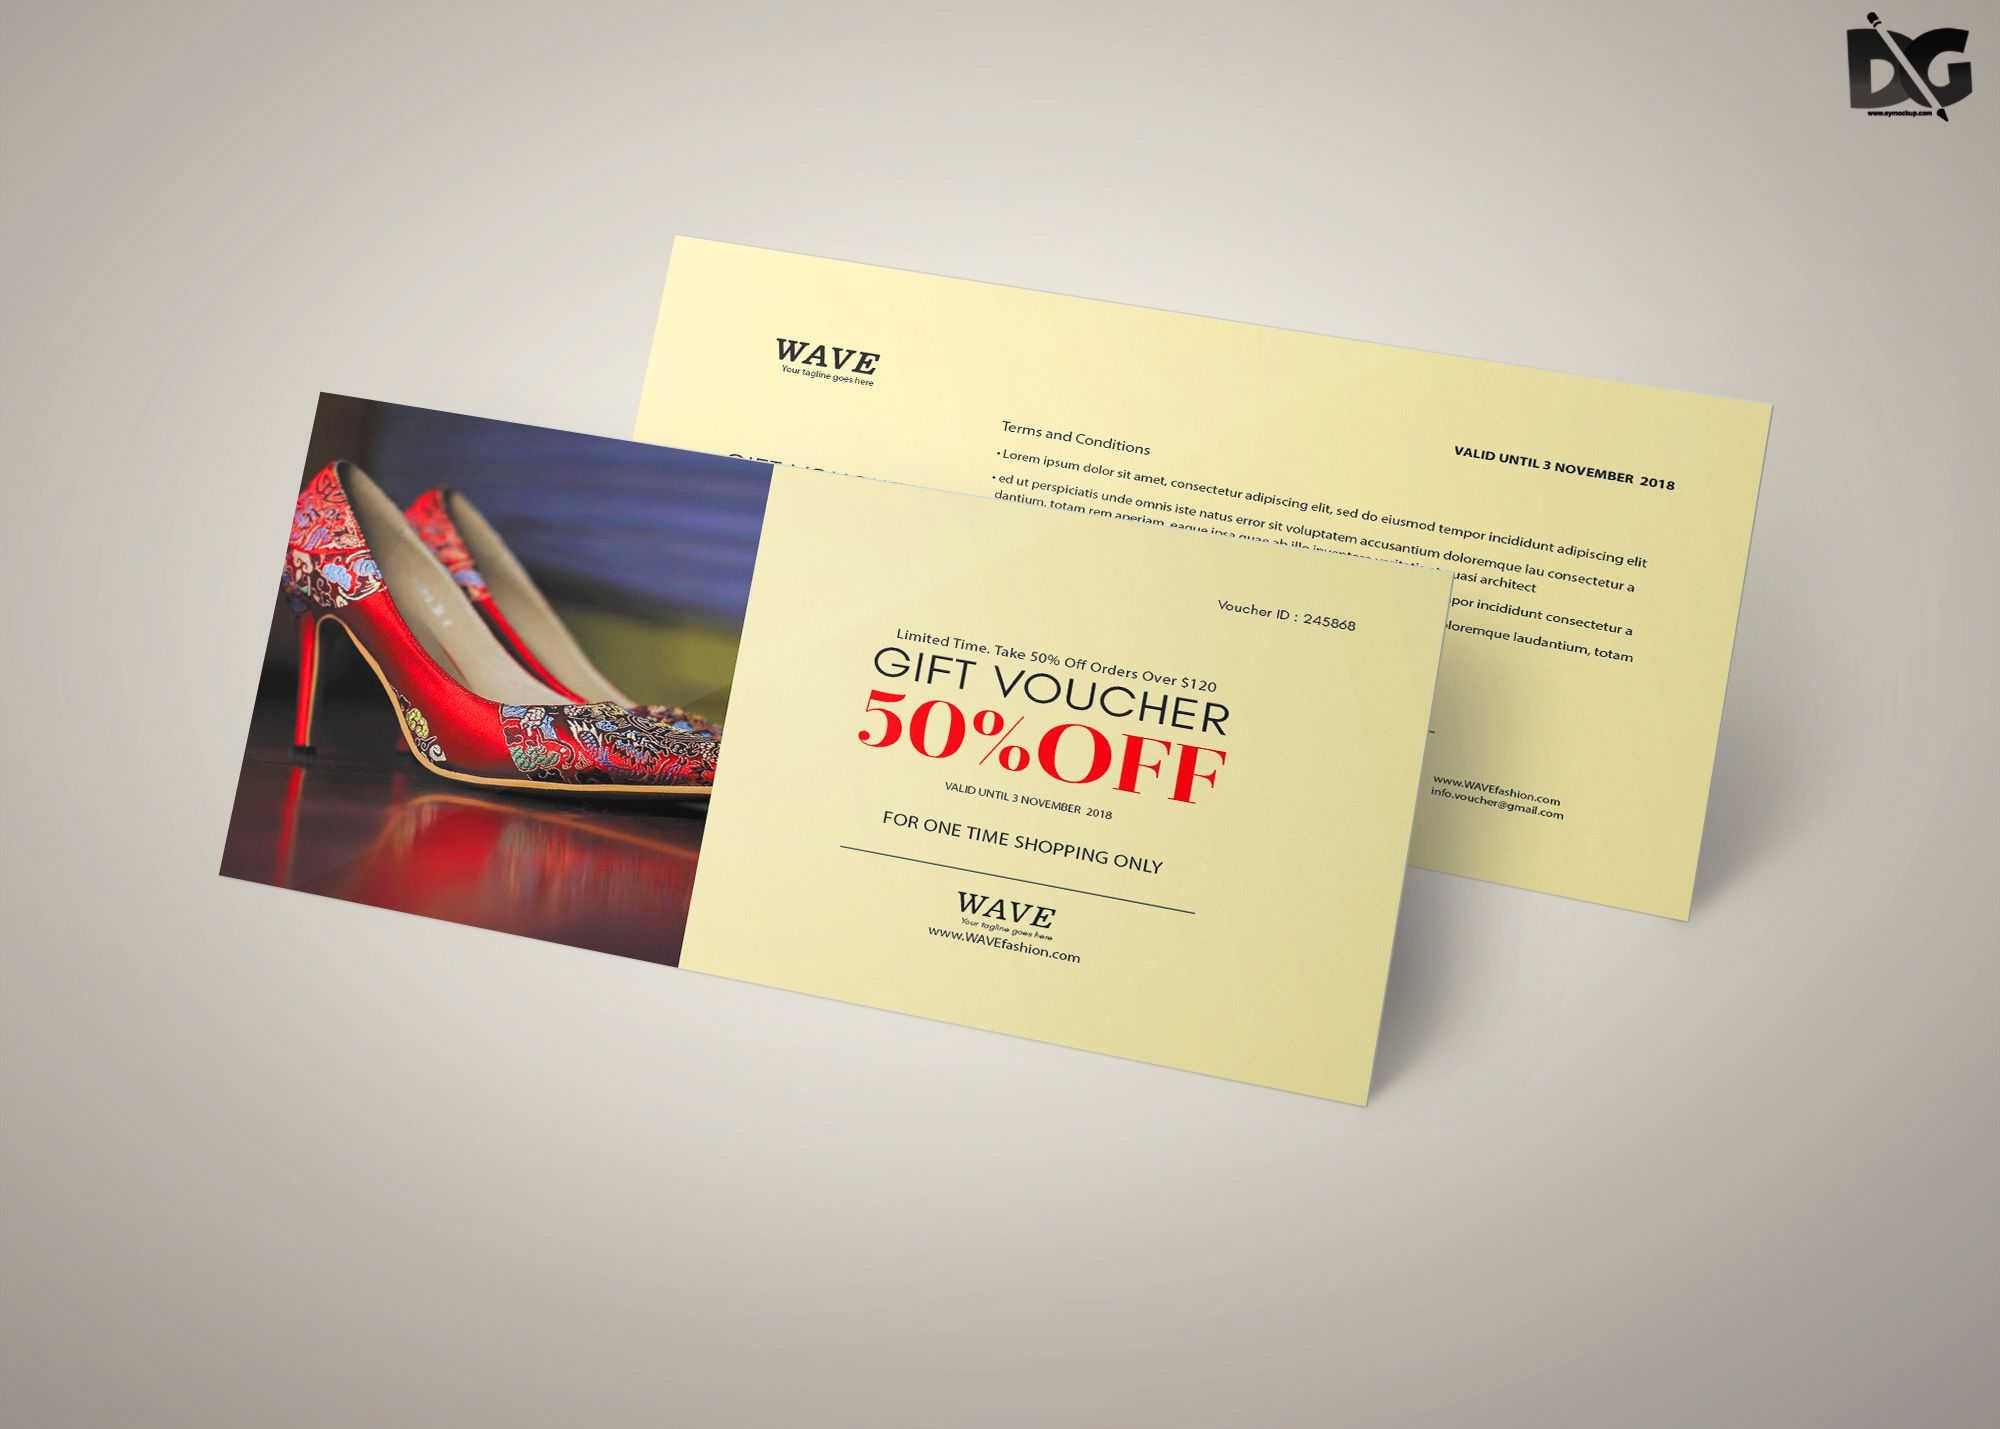 008 Breathtaking Gift Card Template Psd Design  Christma Photoshop Free HolderFull